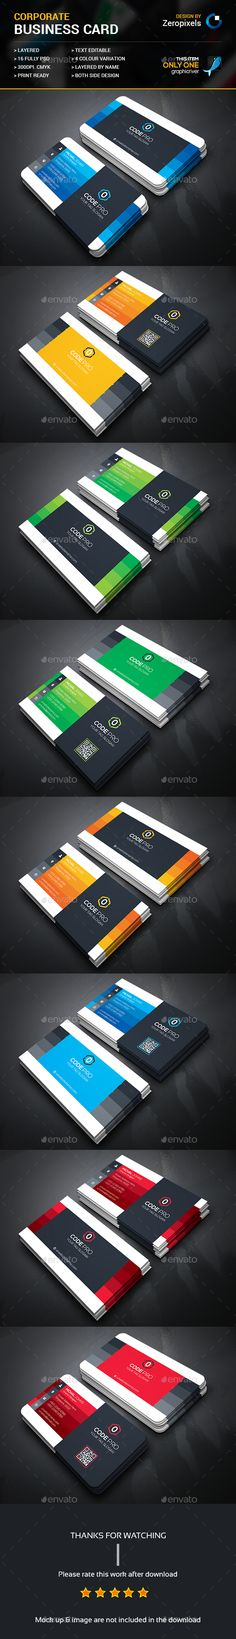 Creative Business Card Template PSD Bundle. Download here: http://graphicriver.net/item/creative-business-card-bundle/16770272?ref=ksioks